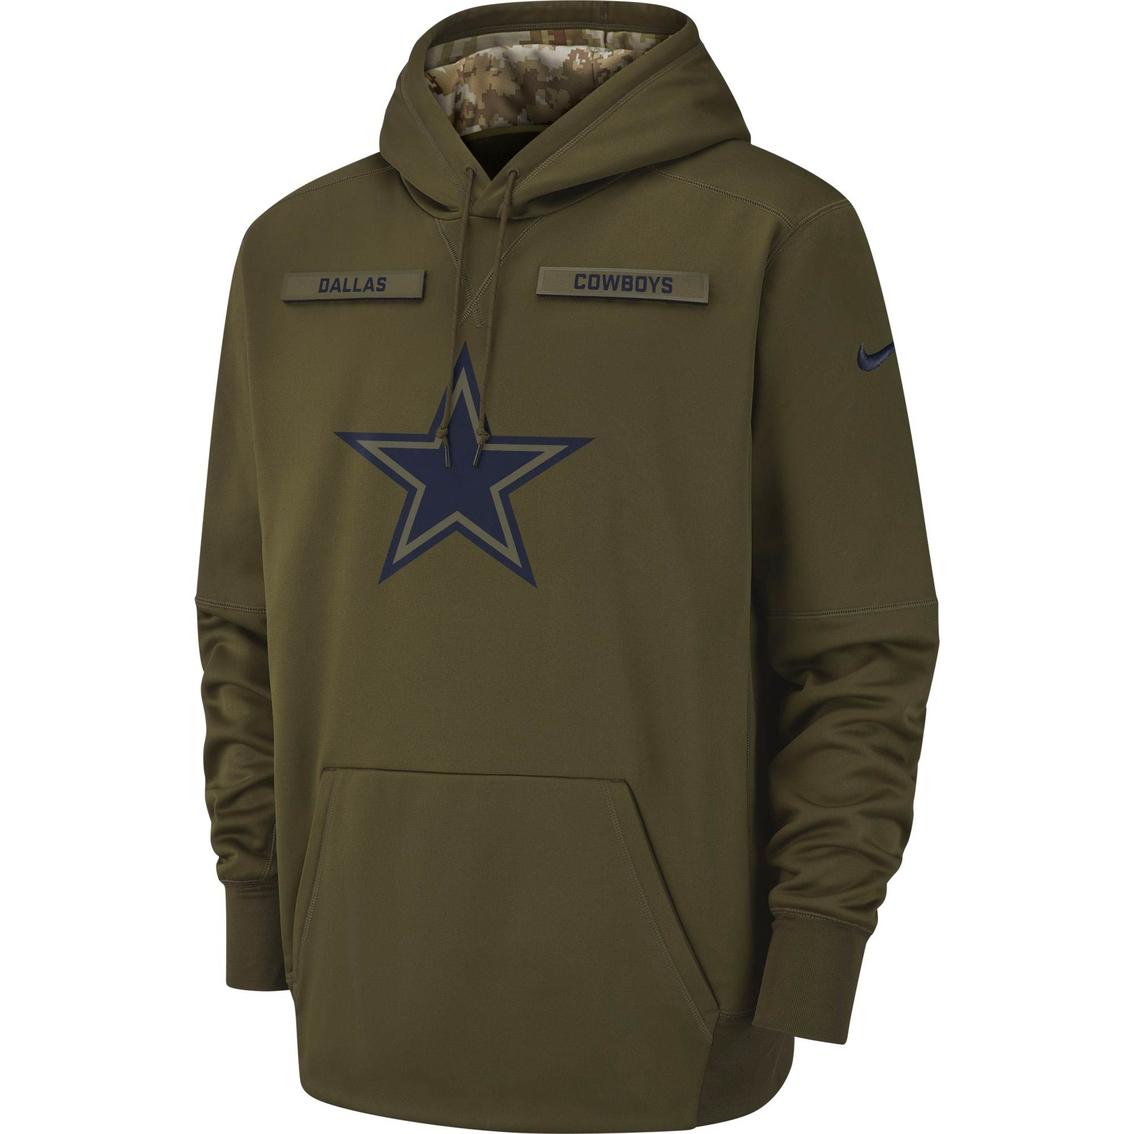 nfl salute to military sweatshirt